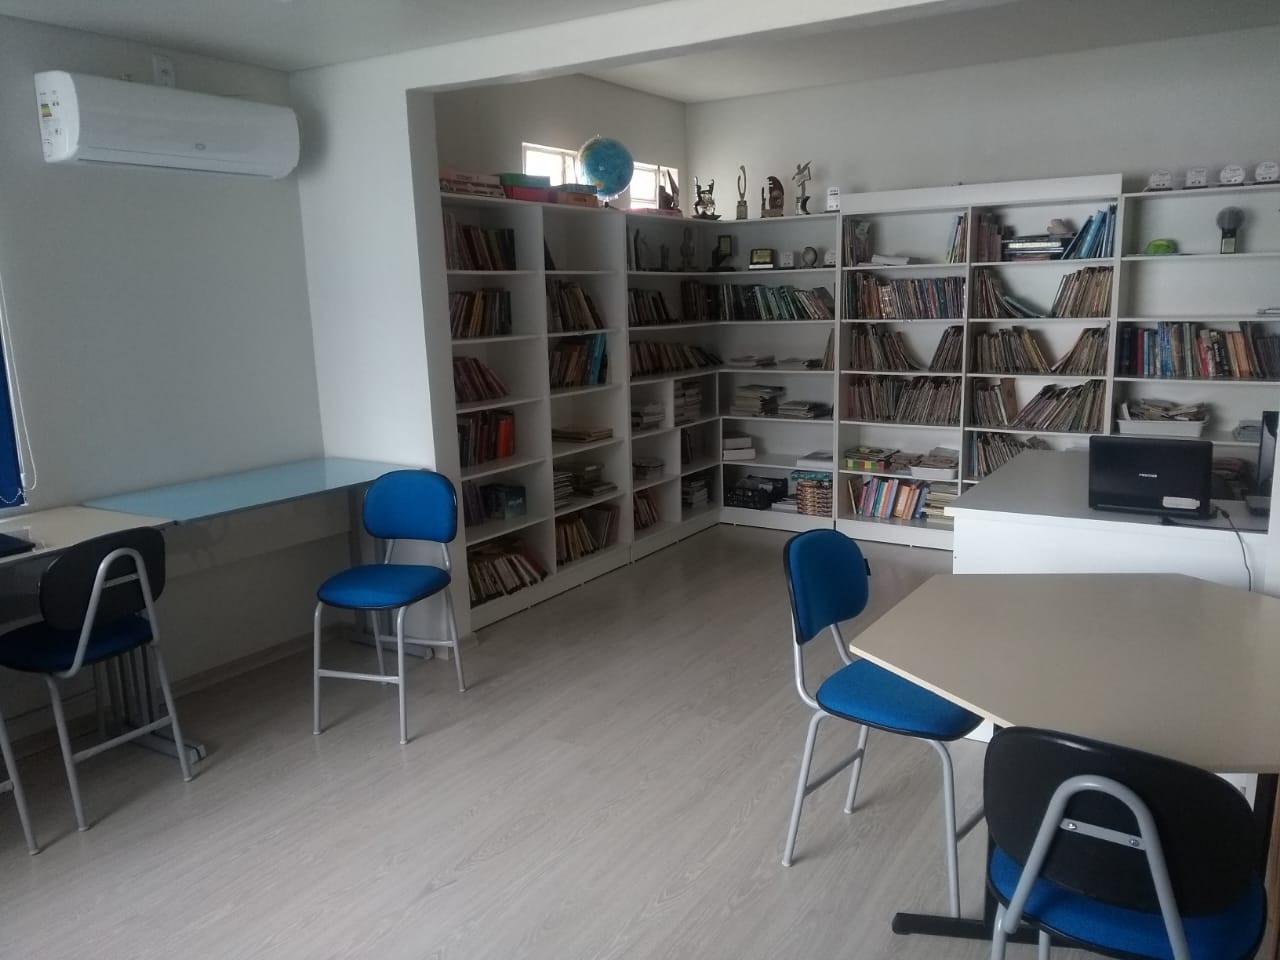 Biblioteca (2).jpeg